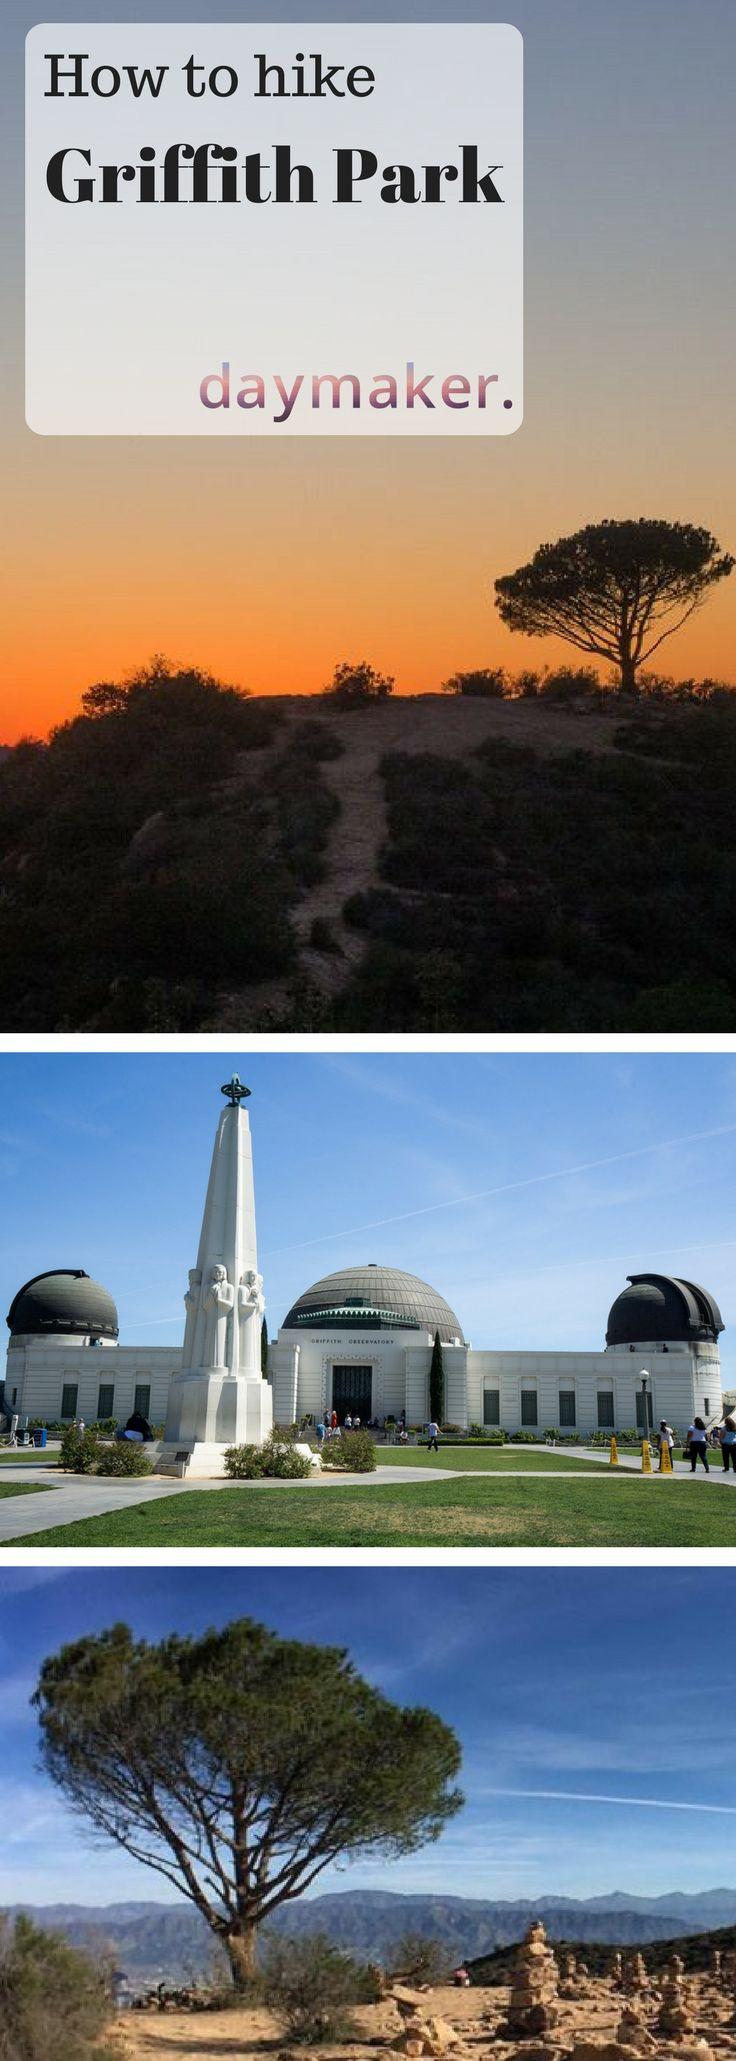 Griffith Park | Hike Griffith Park | Griffith Park Hikes | Hiking Los Angeles